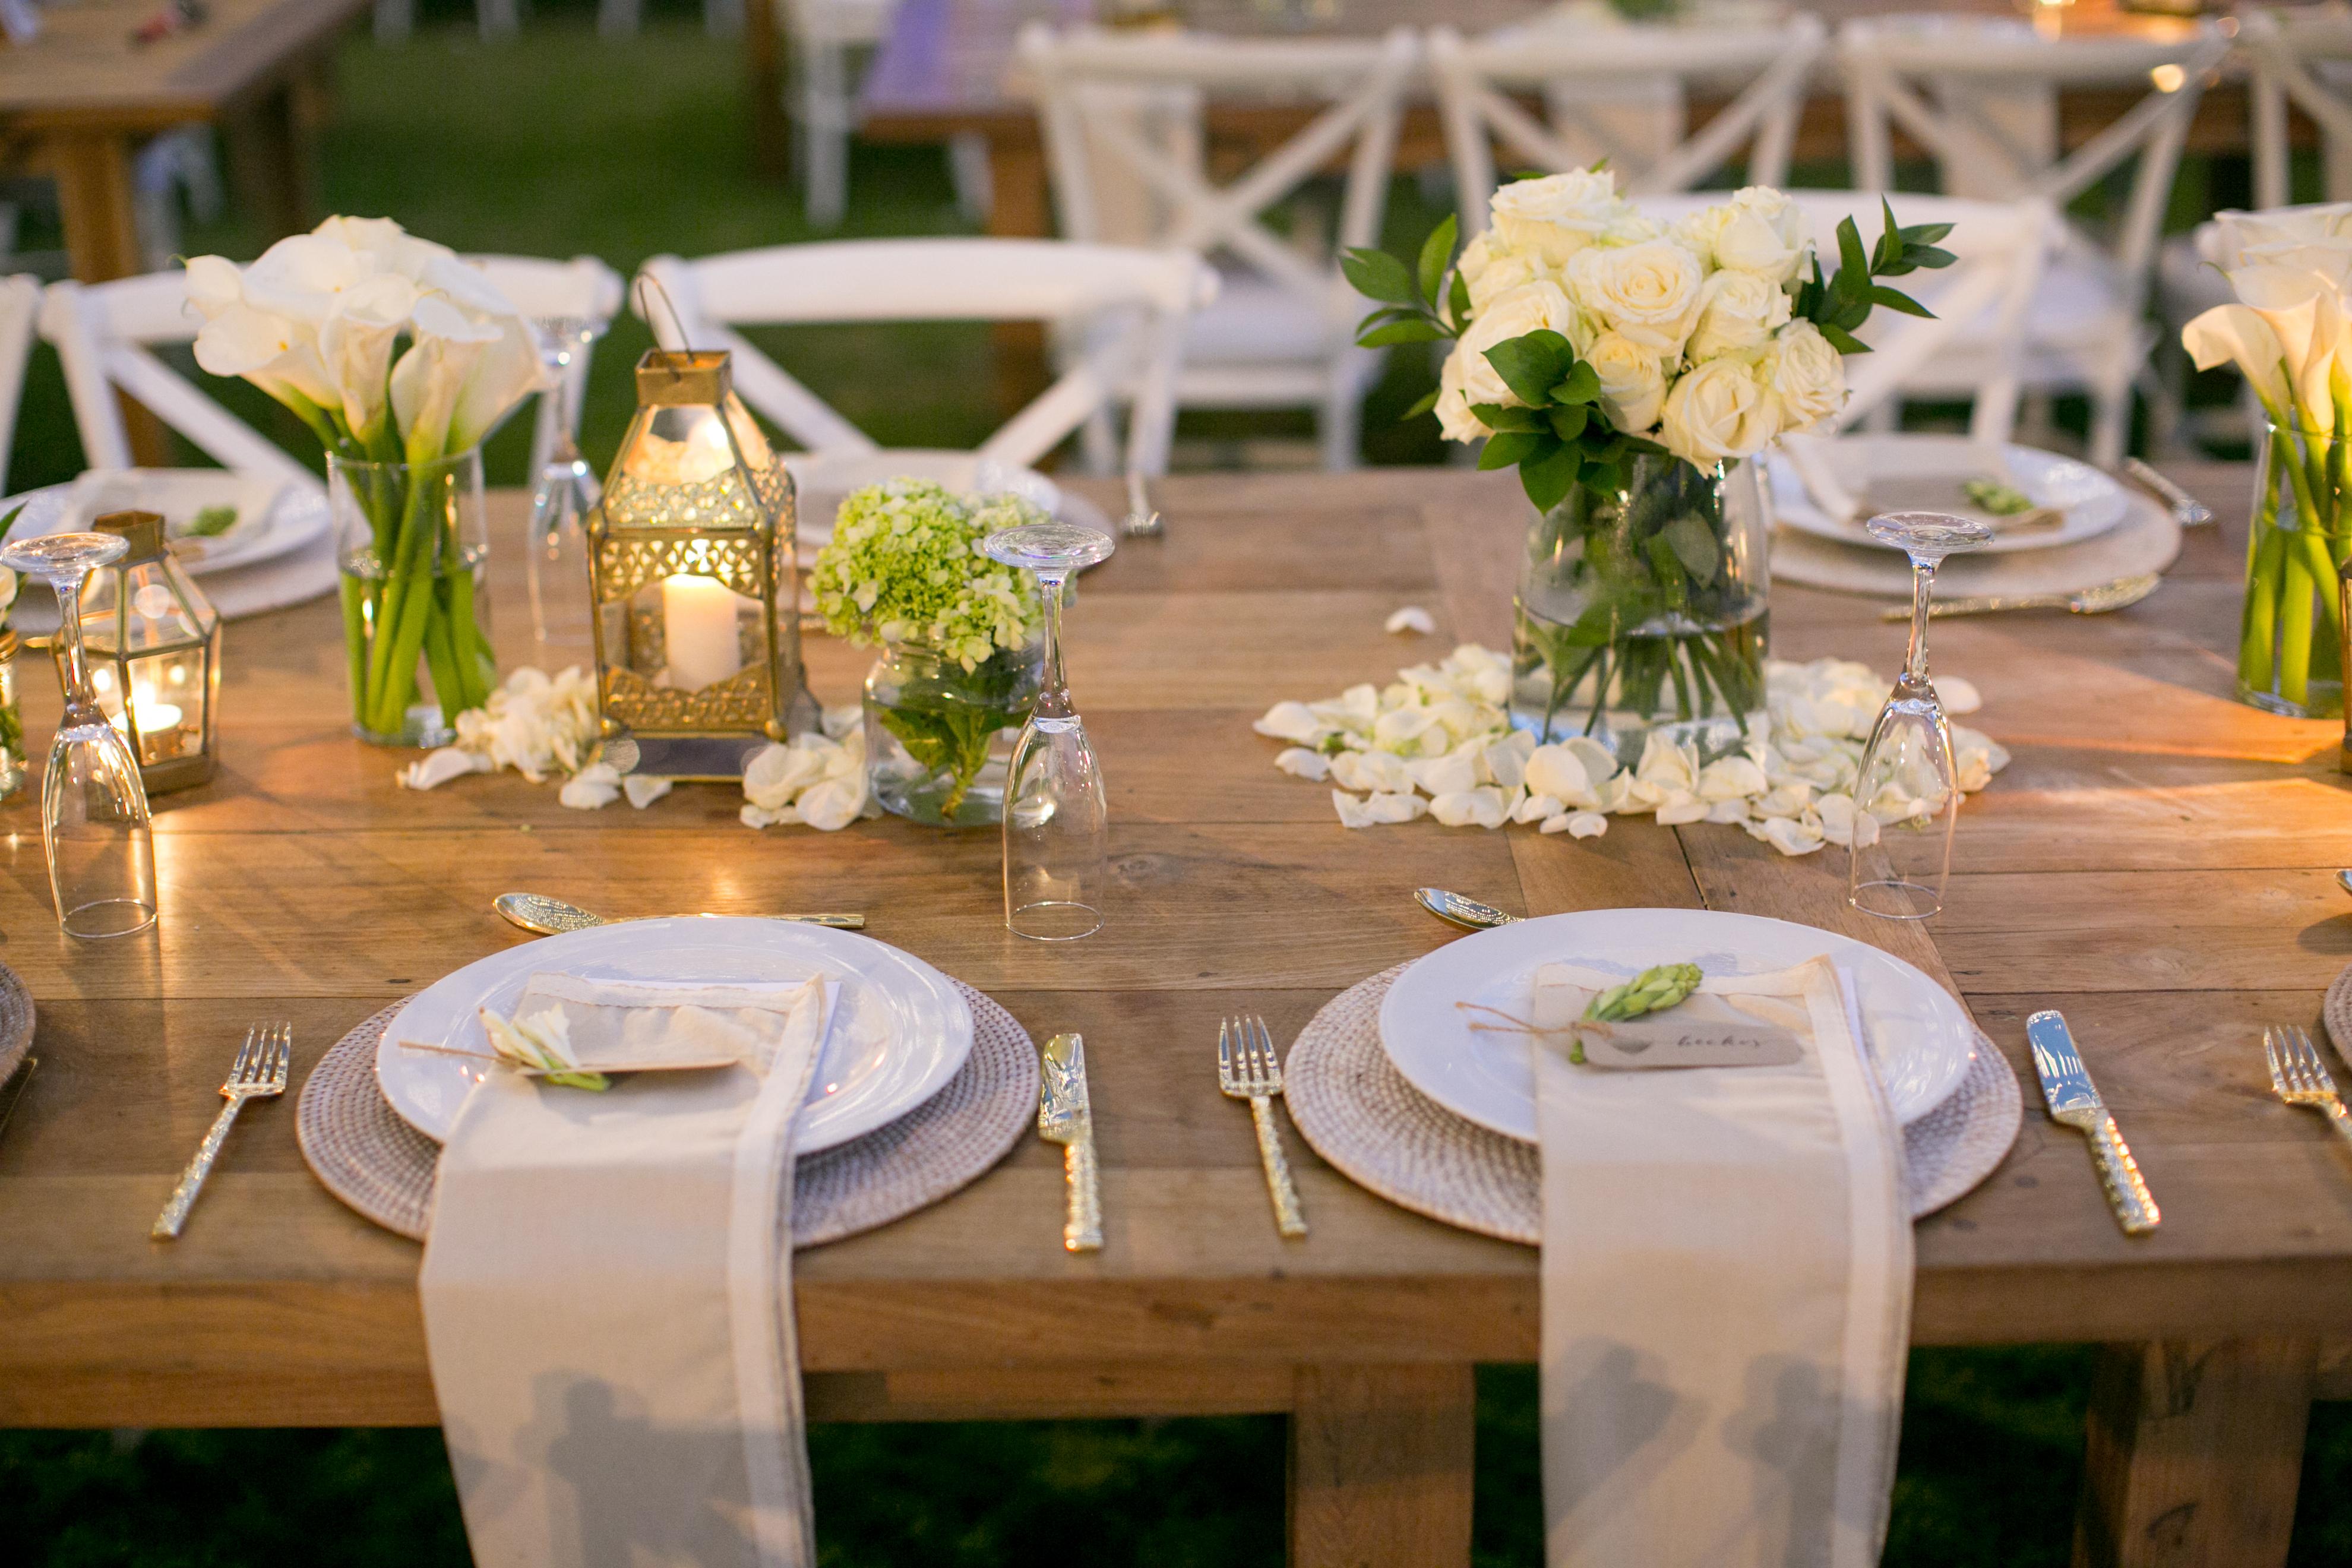 Garden wedding by bali event hire bridestory junglespirit Image collections